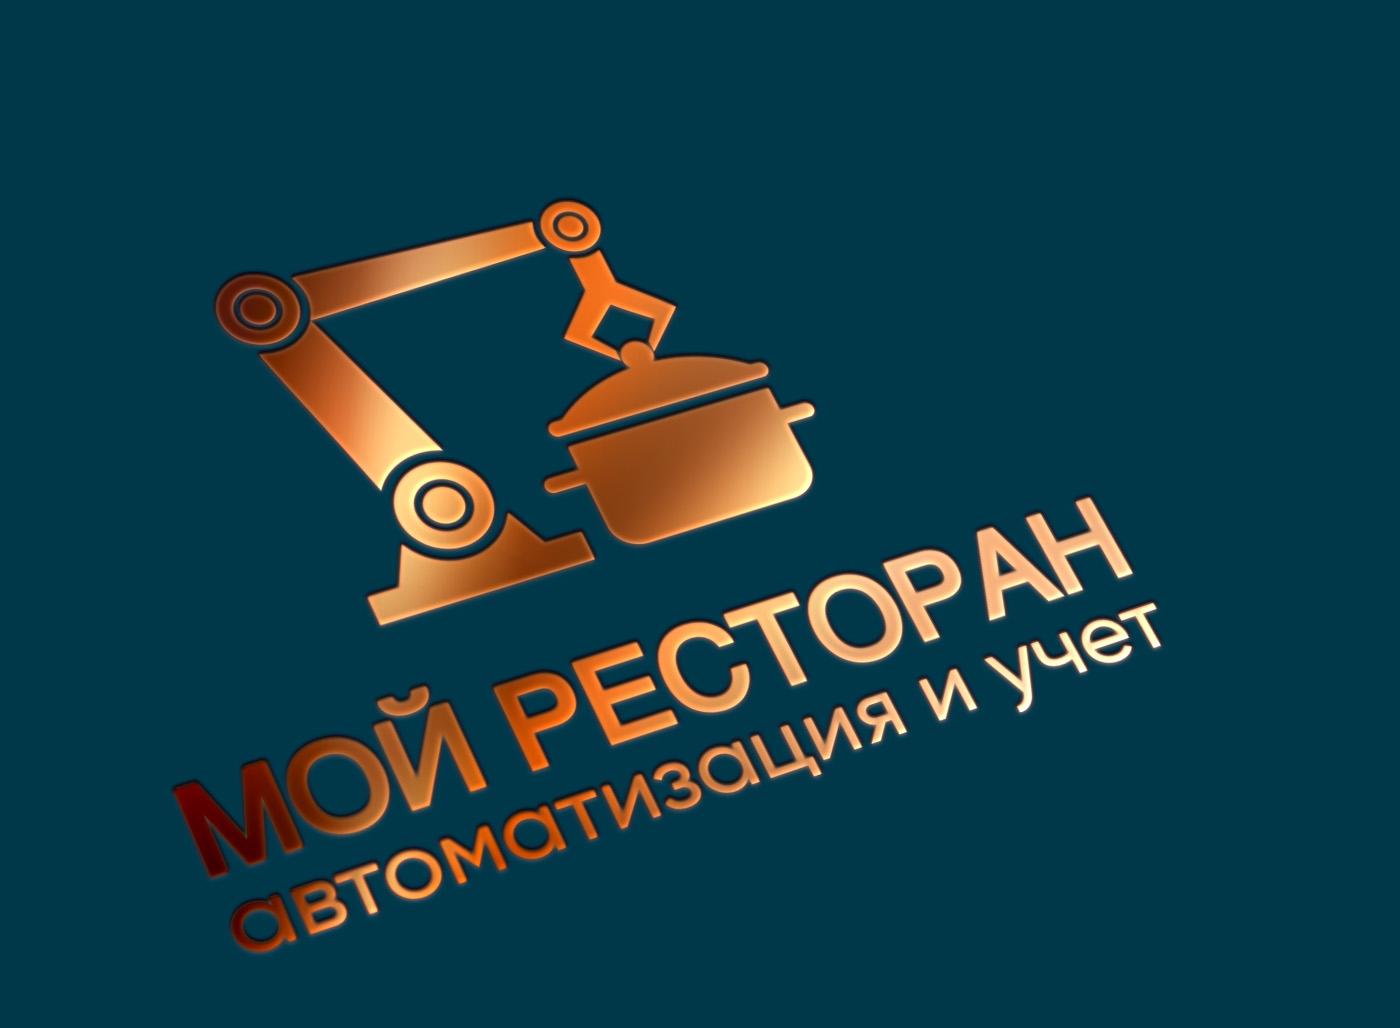 Разработать логотип и фавикон для IT- компании фото f_4995d552d73b3c5f.jpg